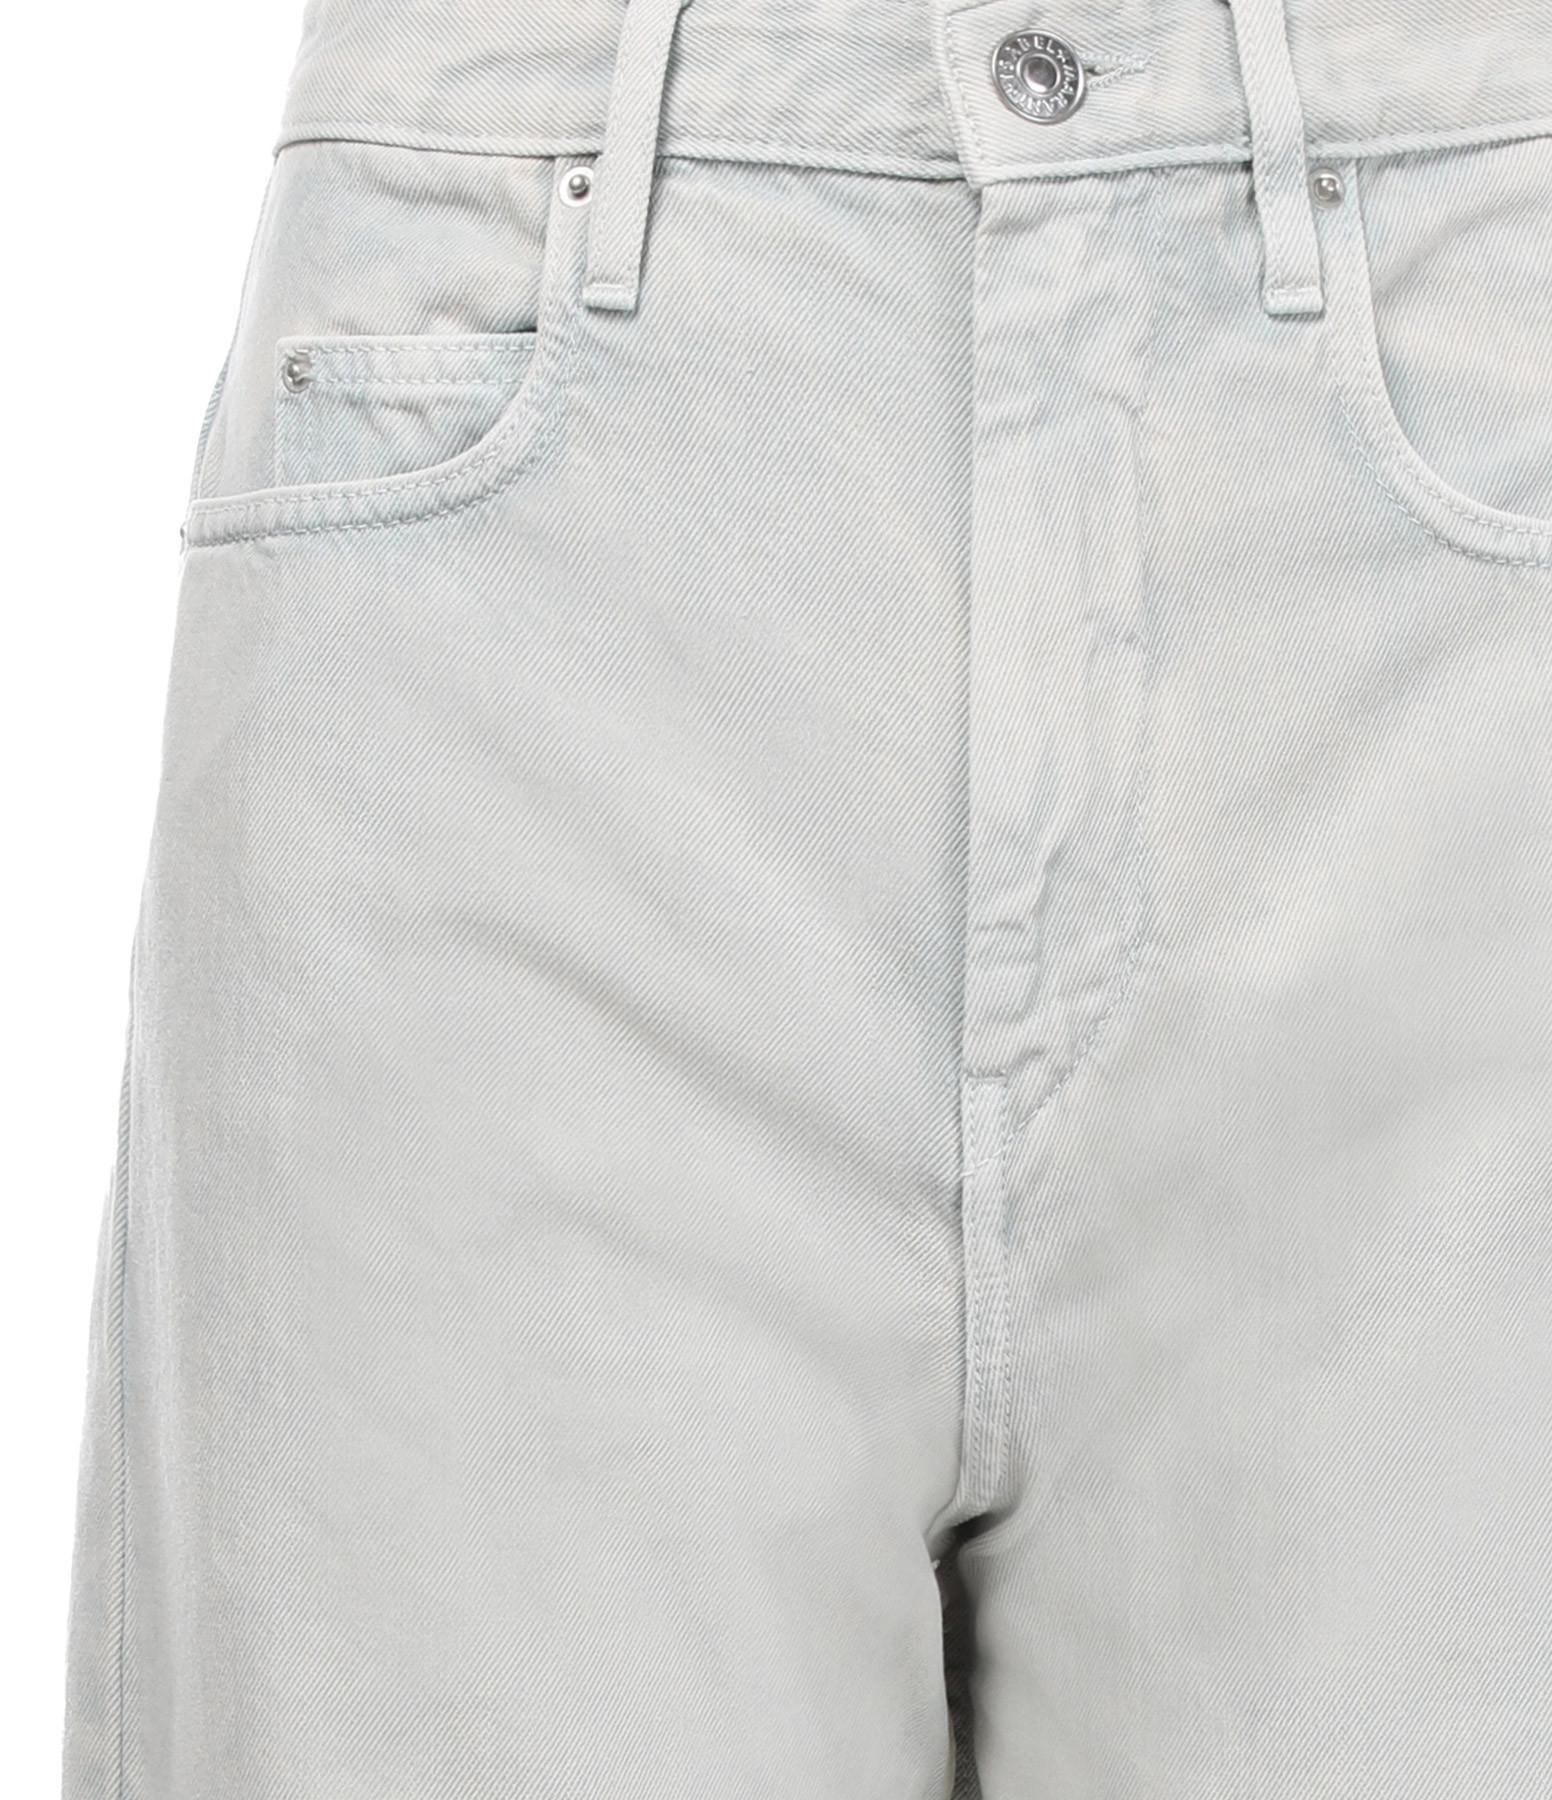 ISABEL MARANT ÉTOILE - Pantalon Corsy Coton Amande